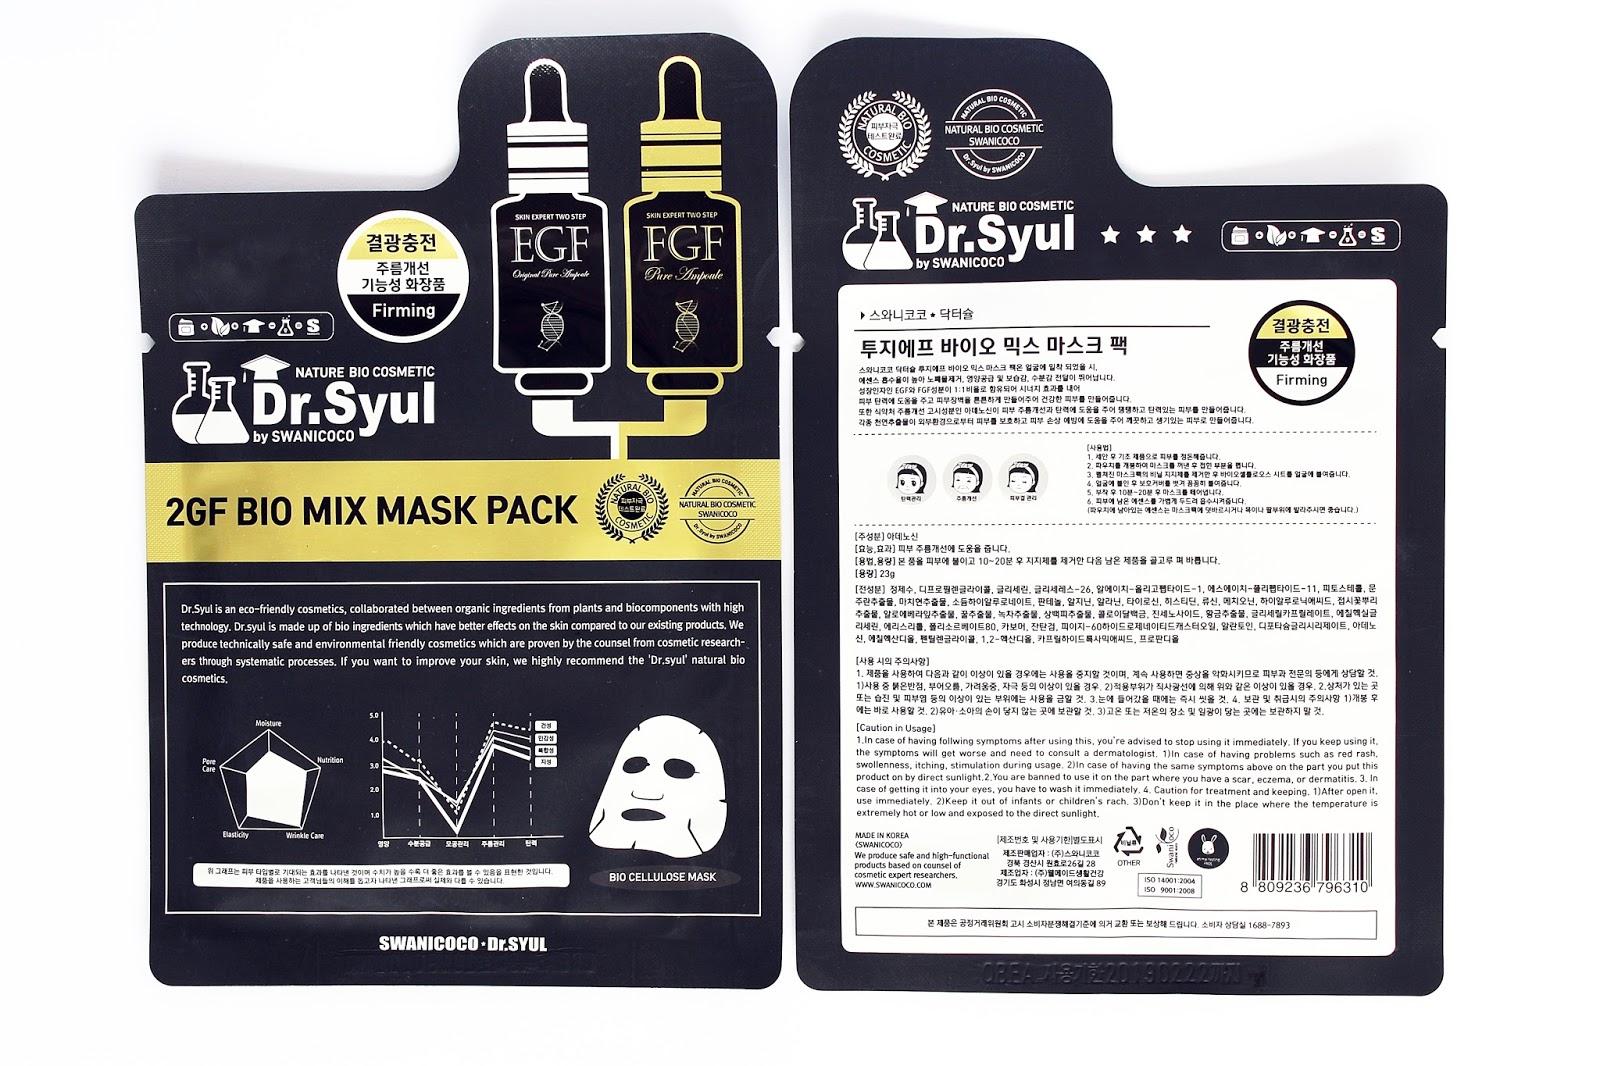 Swanicoco, 2GF Bio Mix Mask Pack